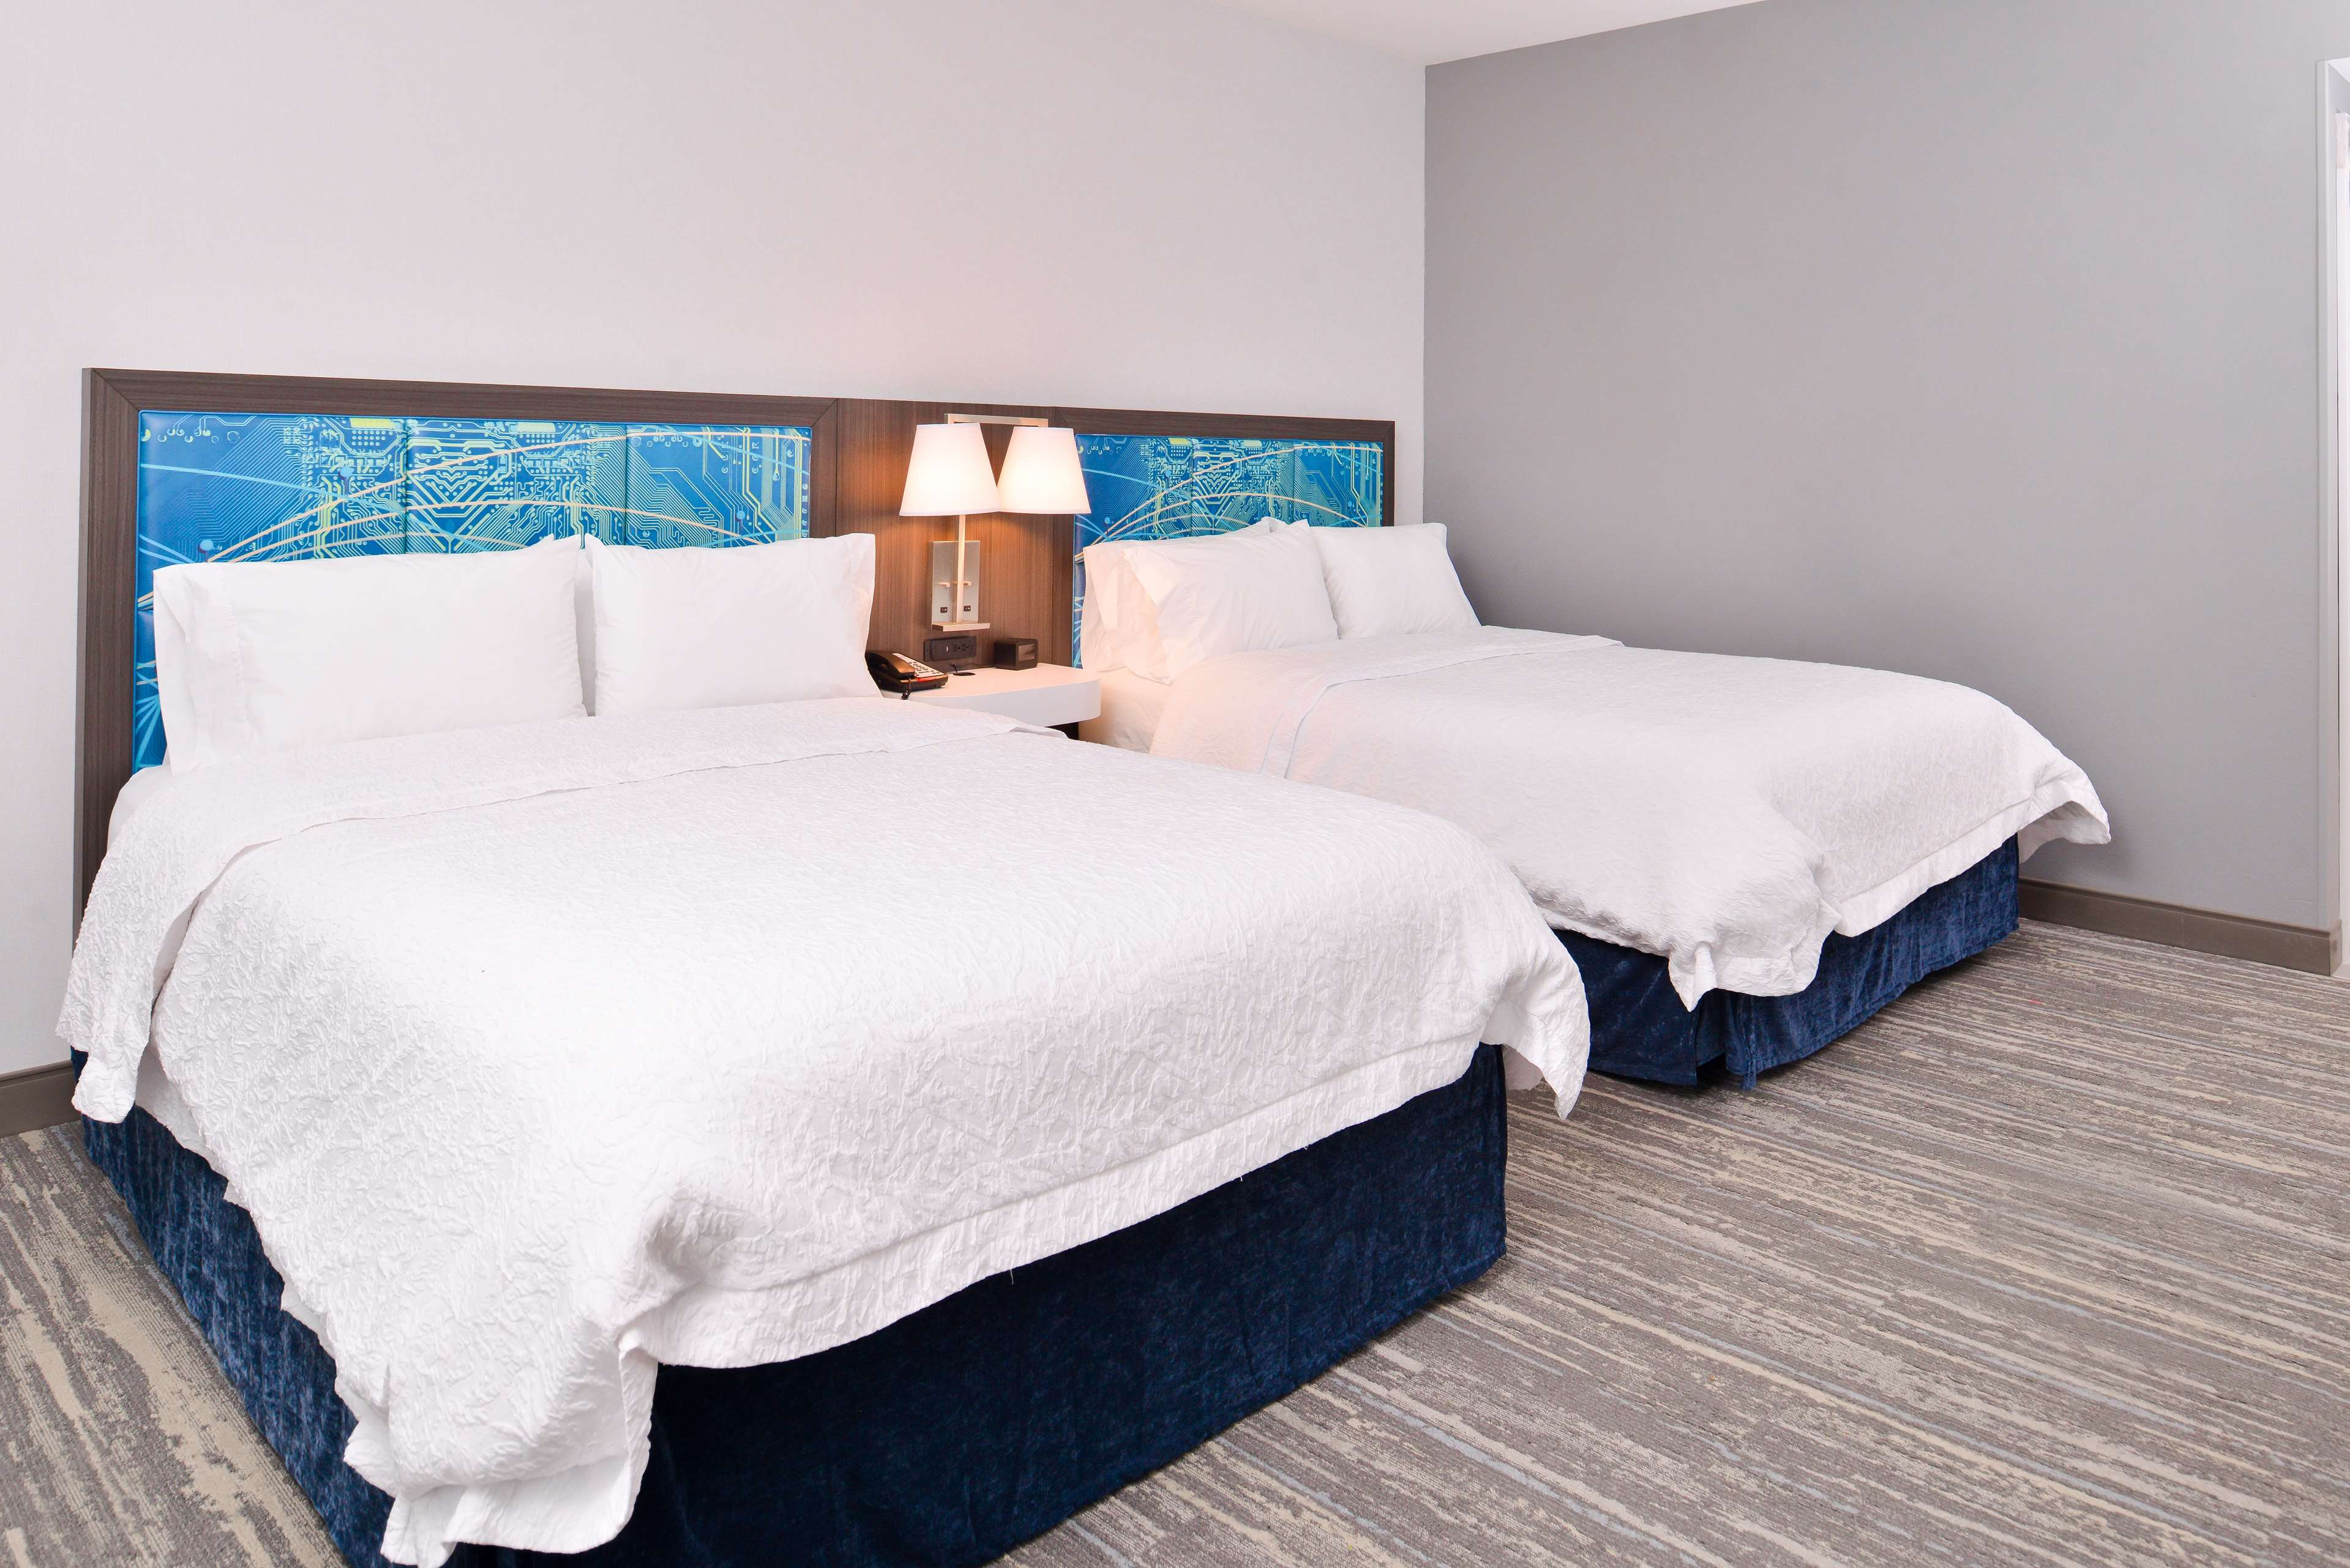 Hampton Inn & Suites St. Paul Oakdale/Woodbury image 26